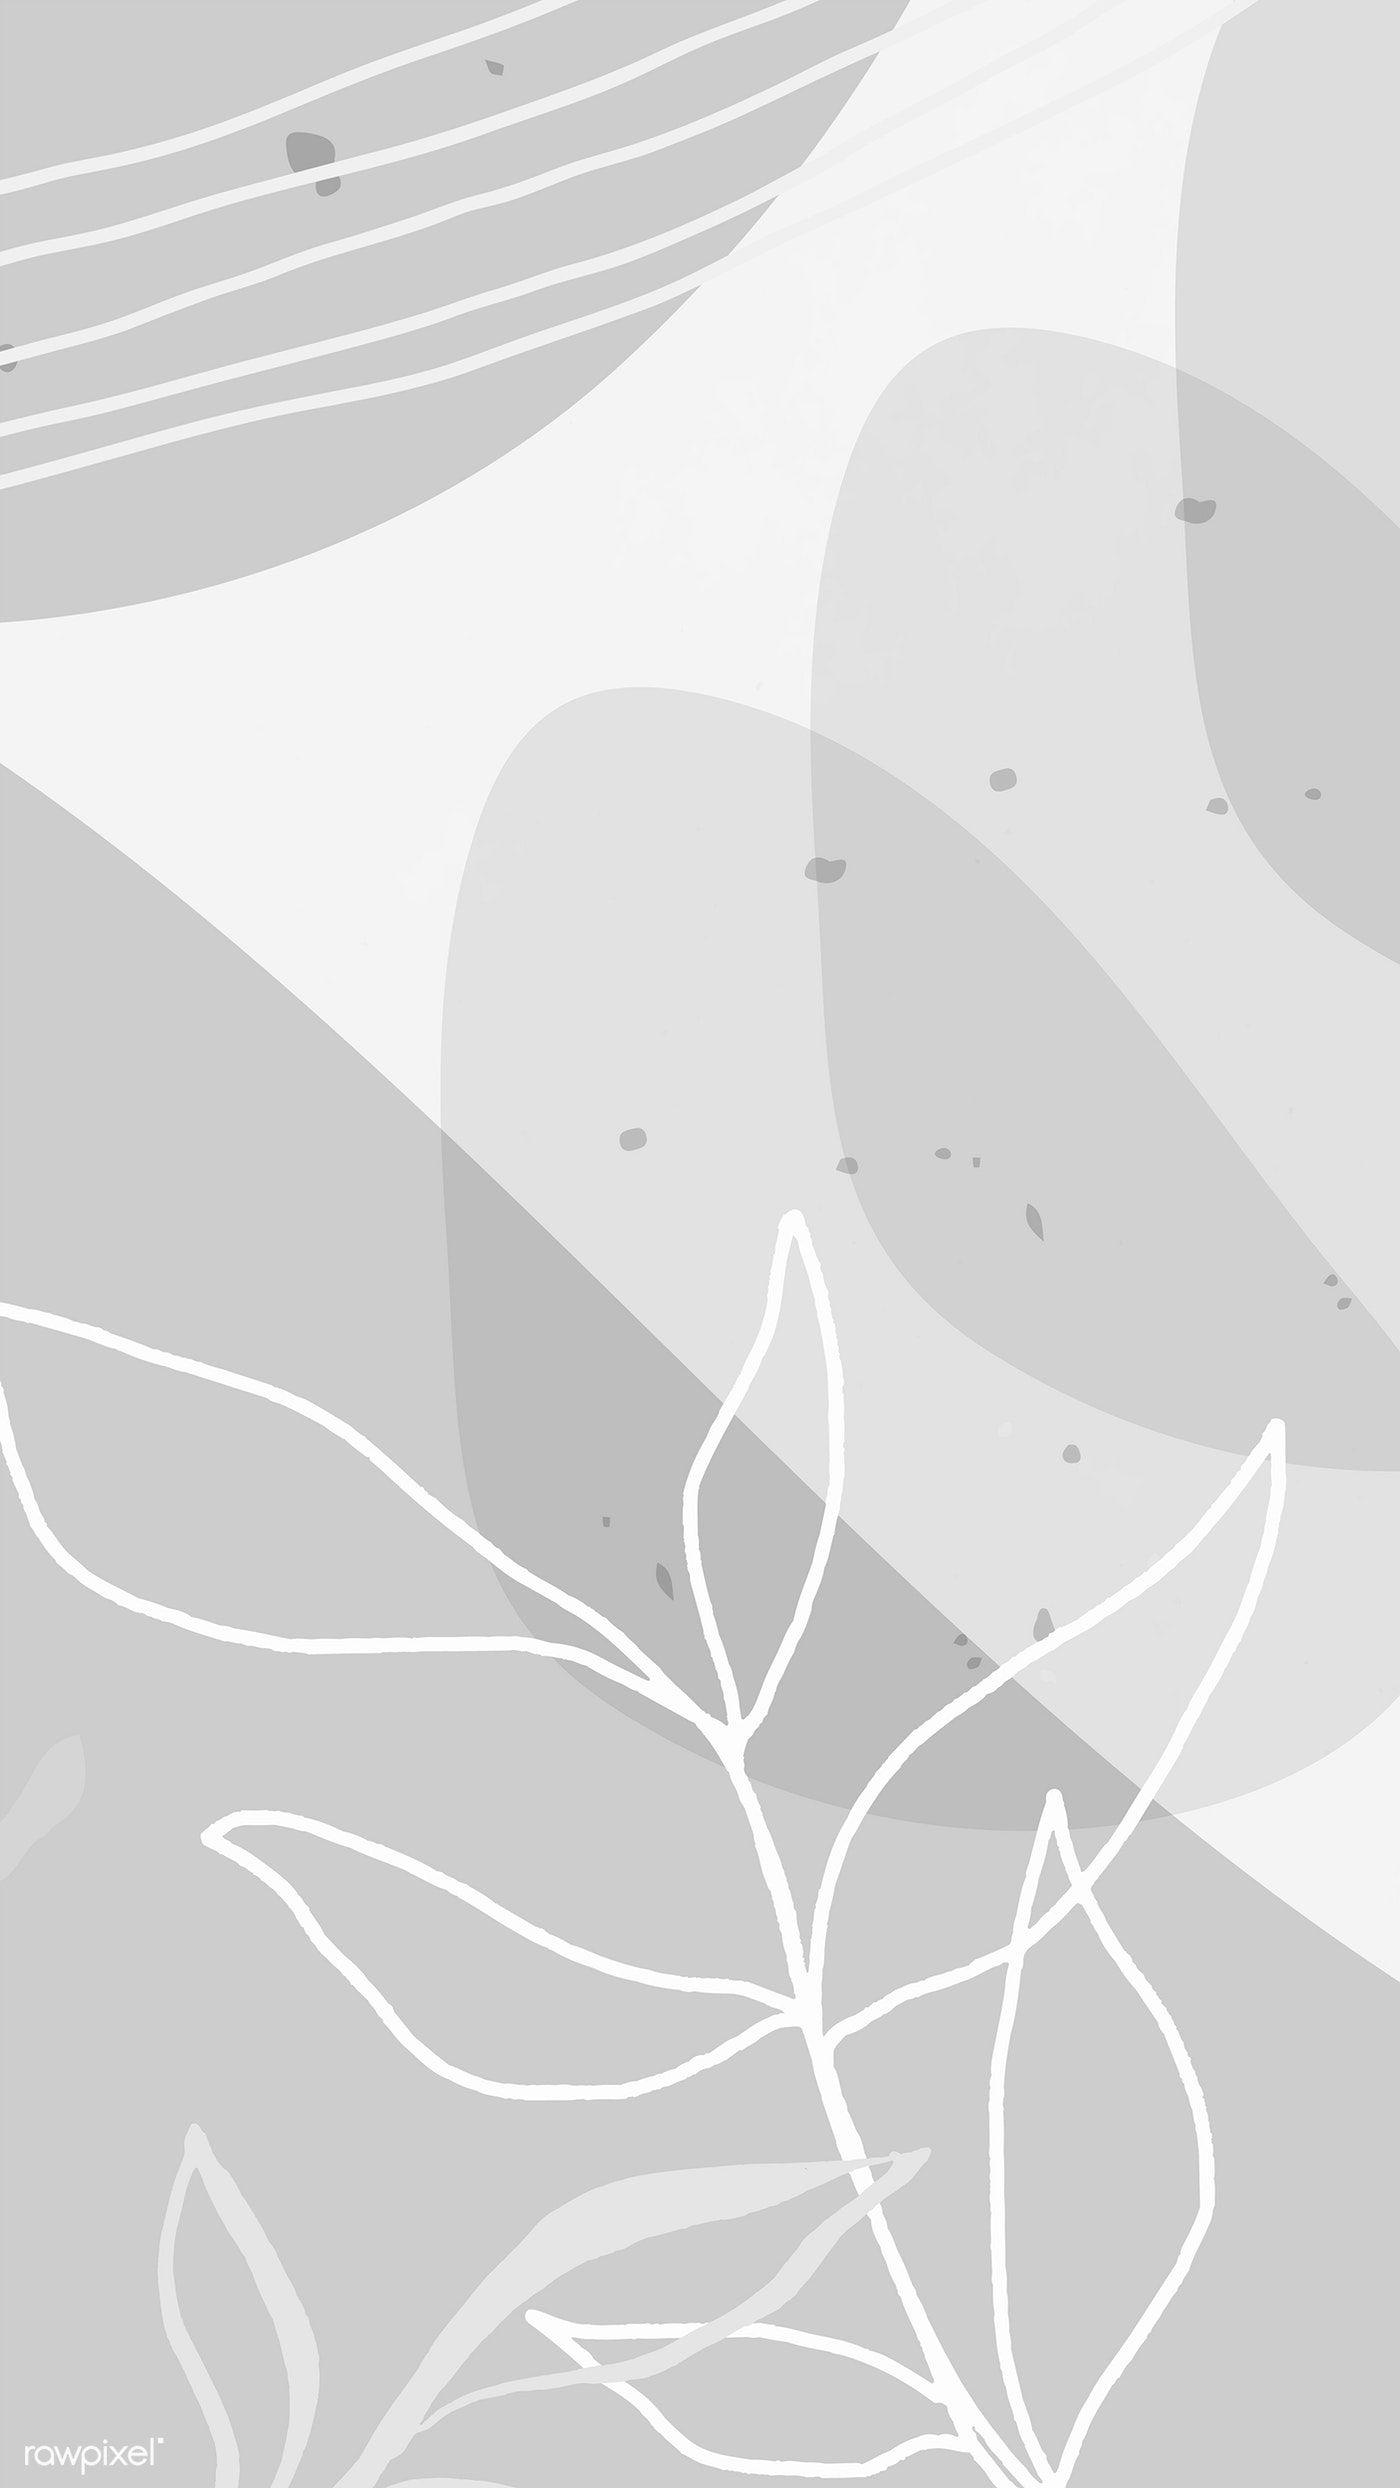 Download Premium Vector Of Abstract Memphis Mobile Phone Wallpaper 2221321 Abstract Wallpaper Design Graphic Wallpaper Aesthetic Iphone Wallpaper